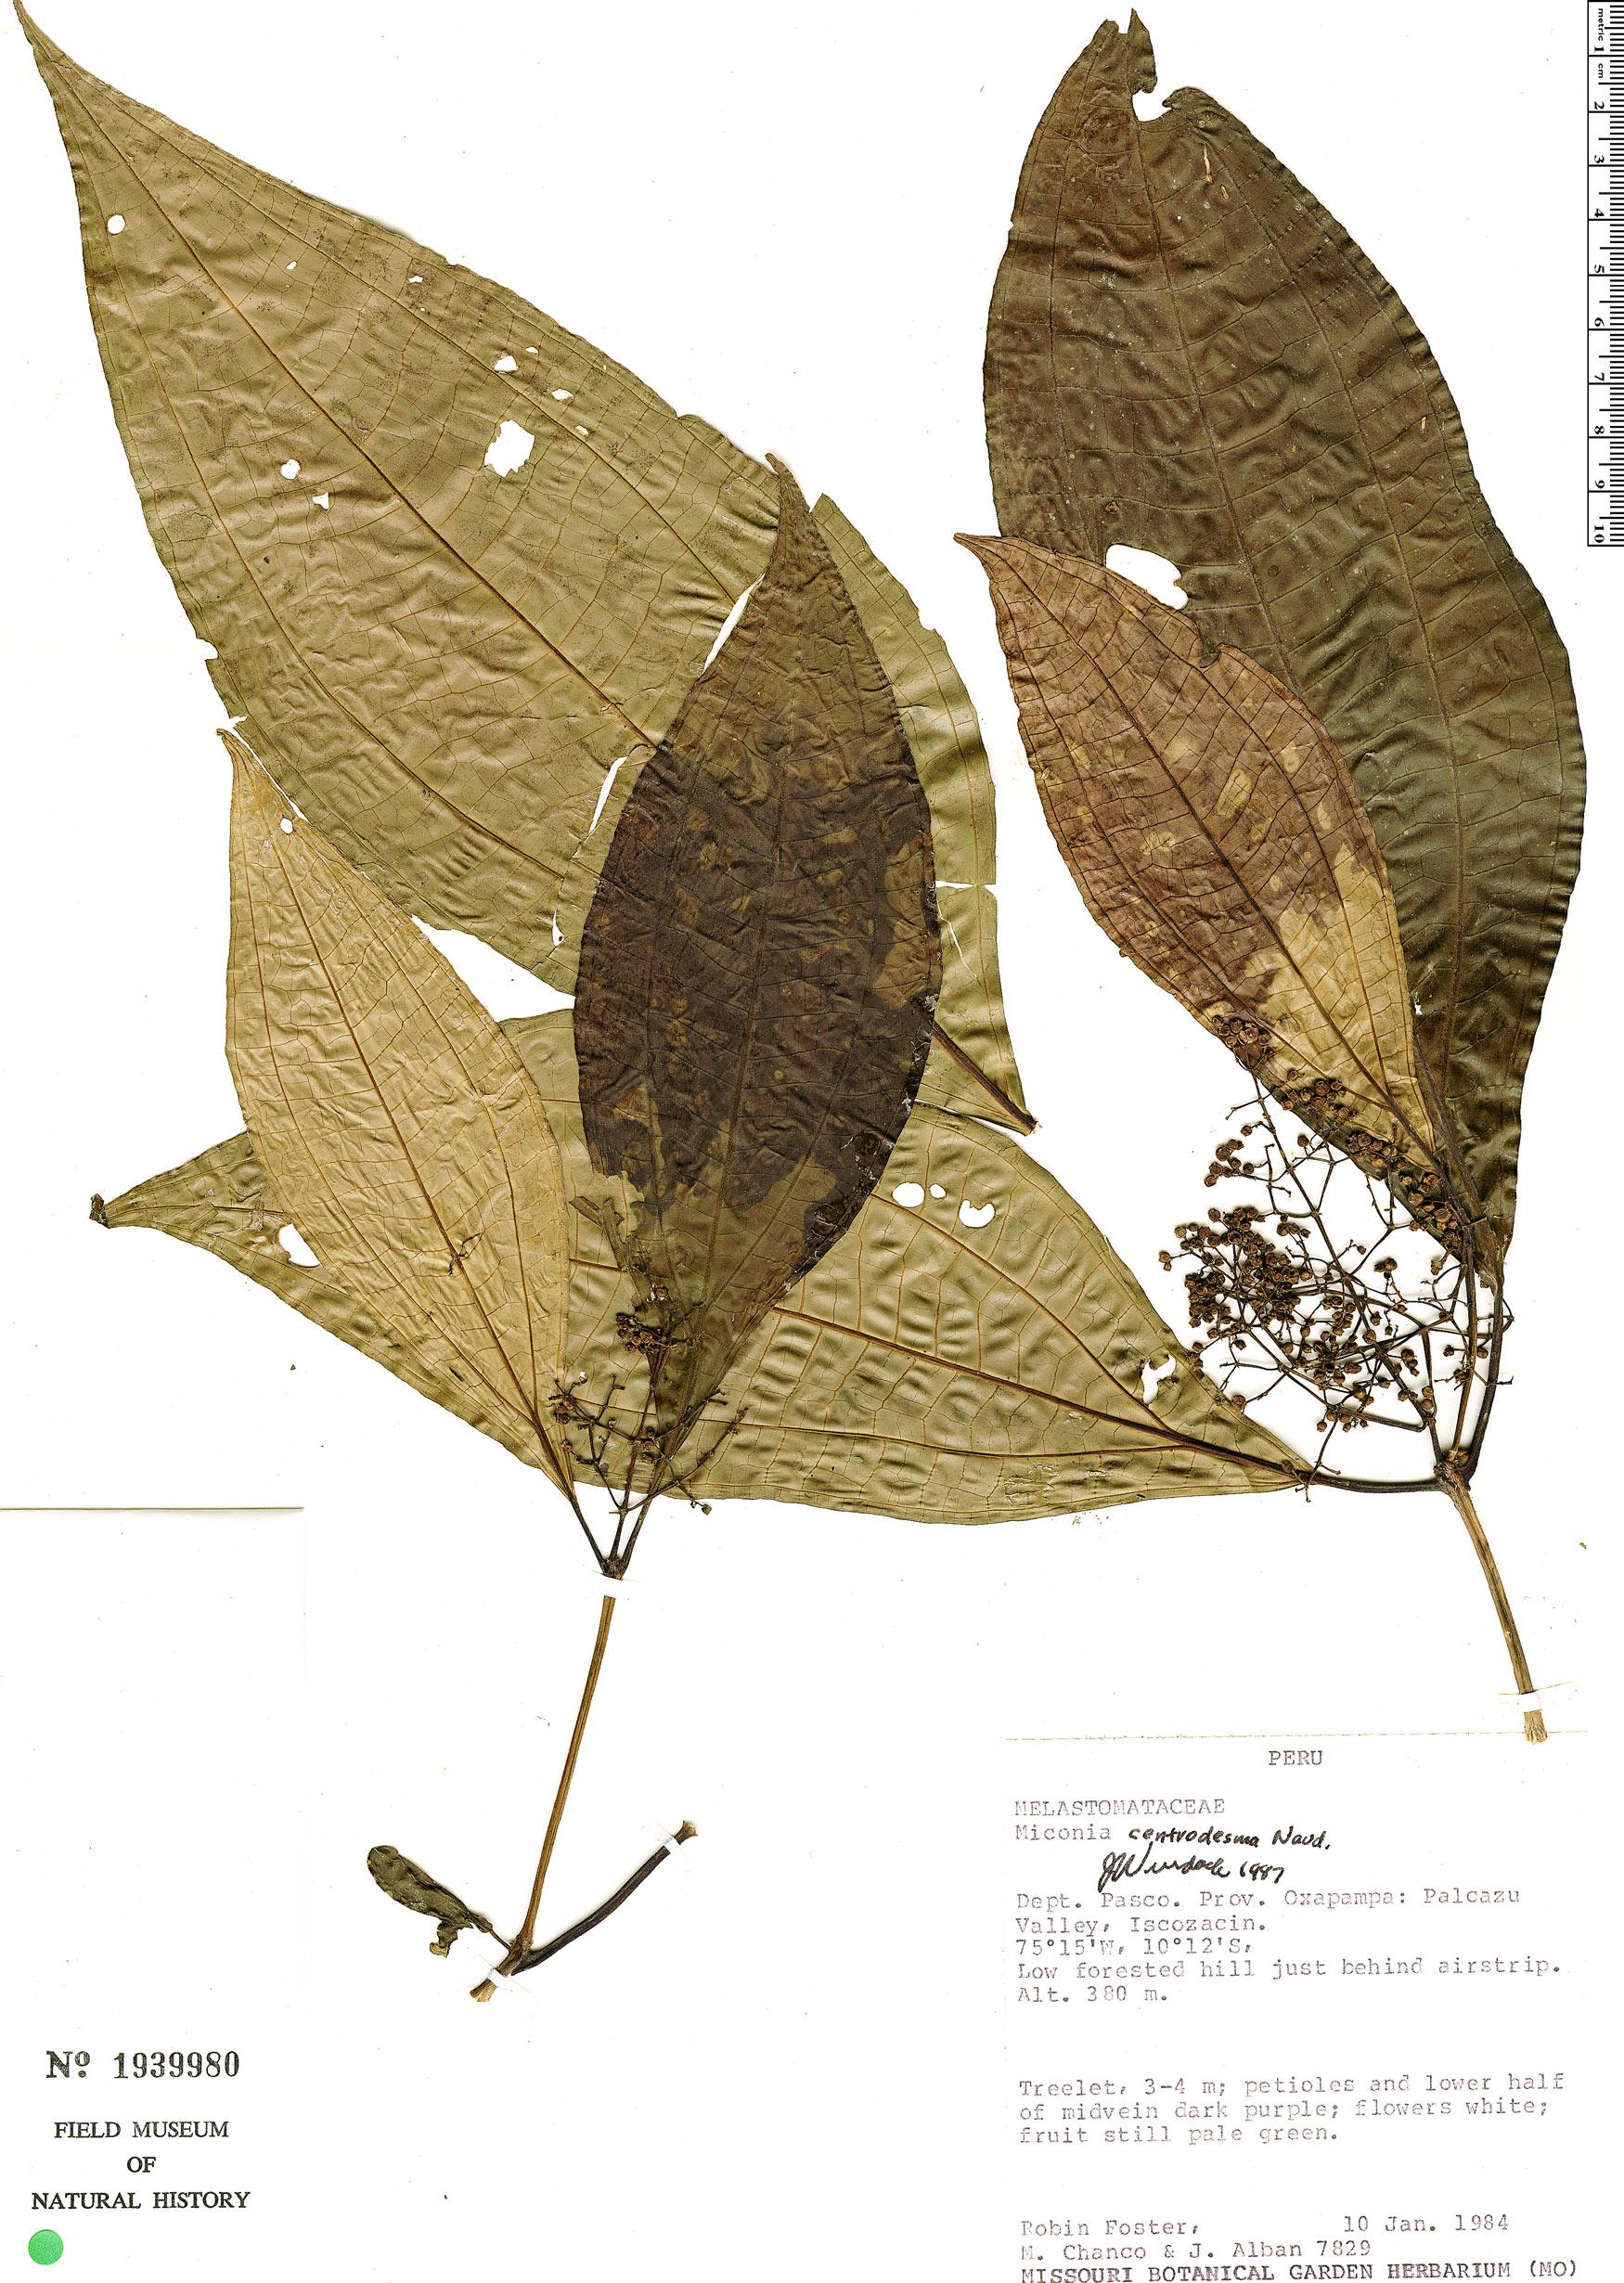 Specimen: Miconia centrodesma